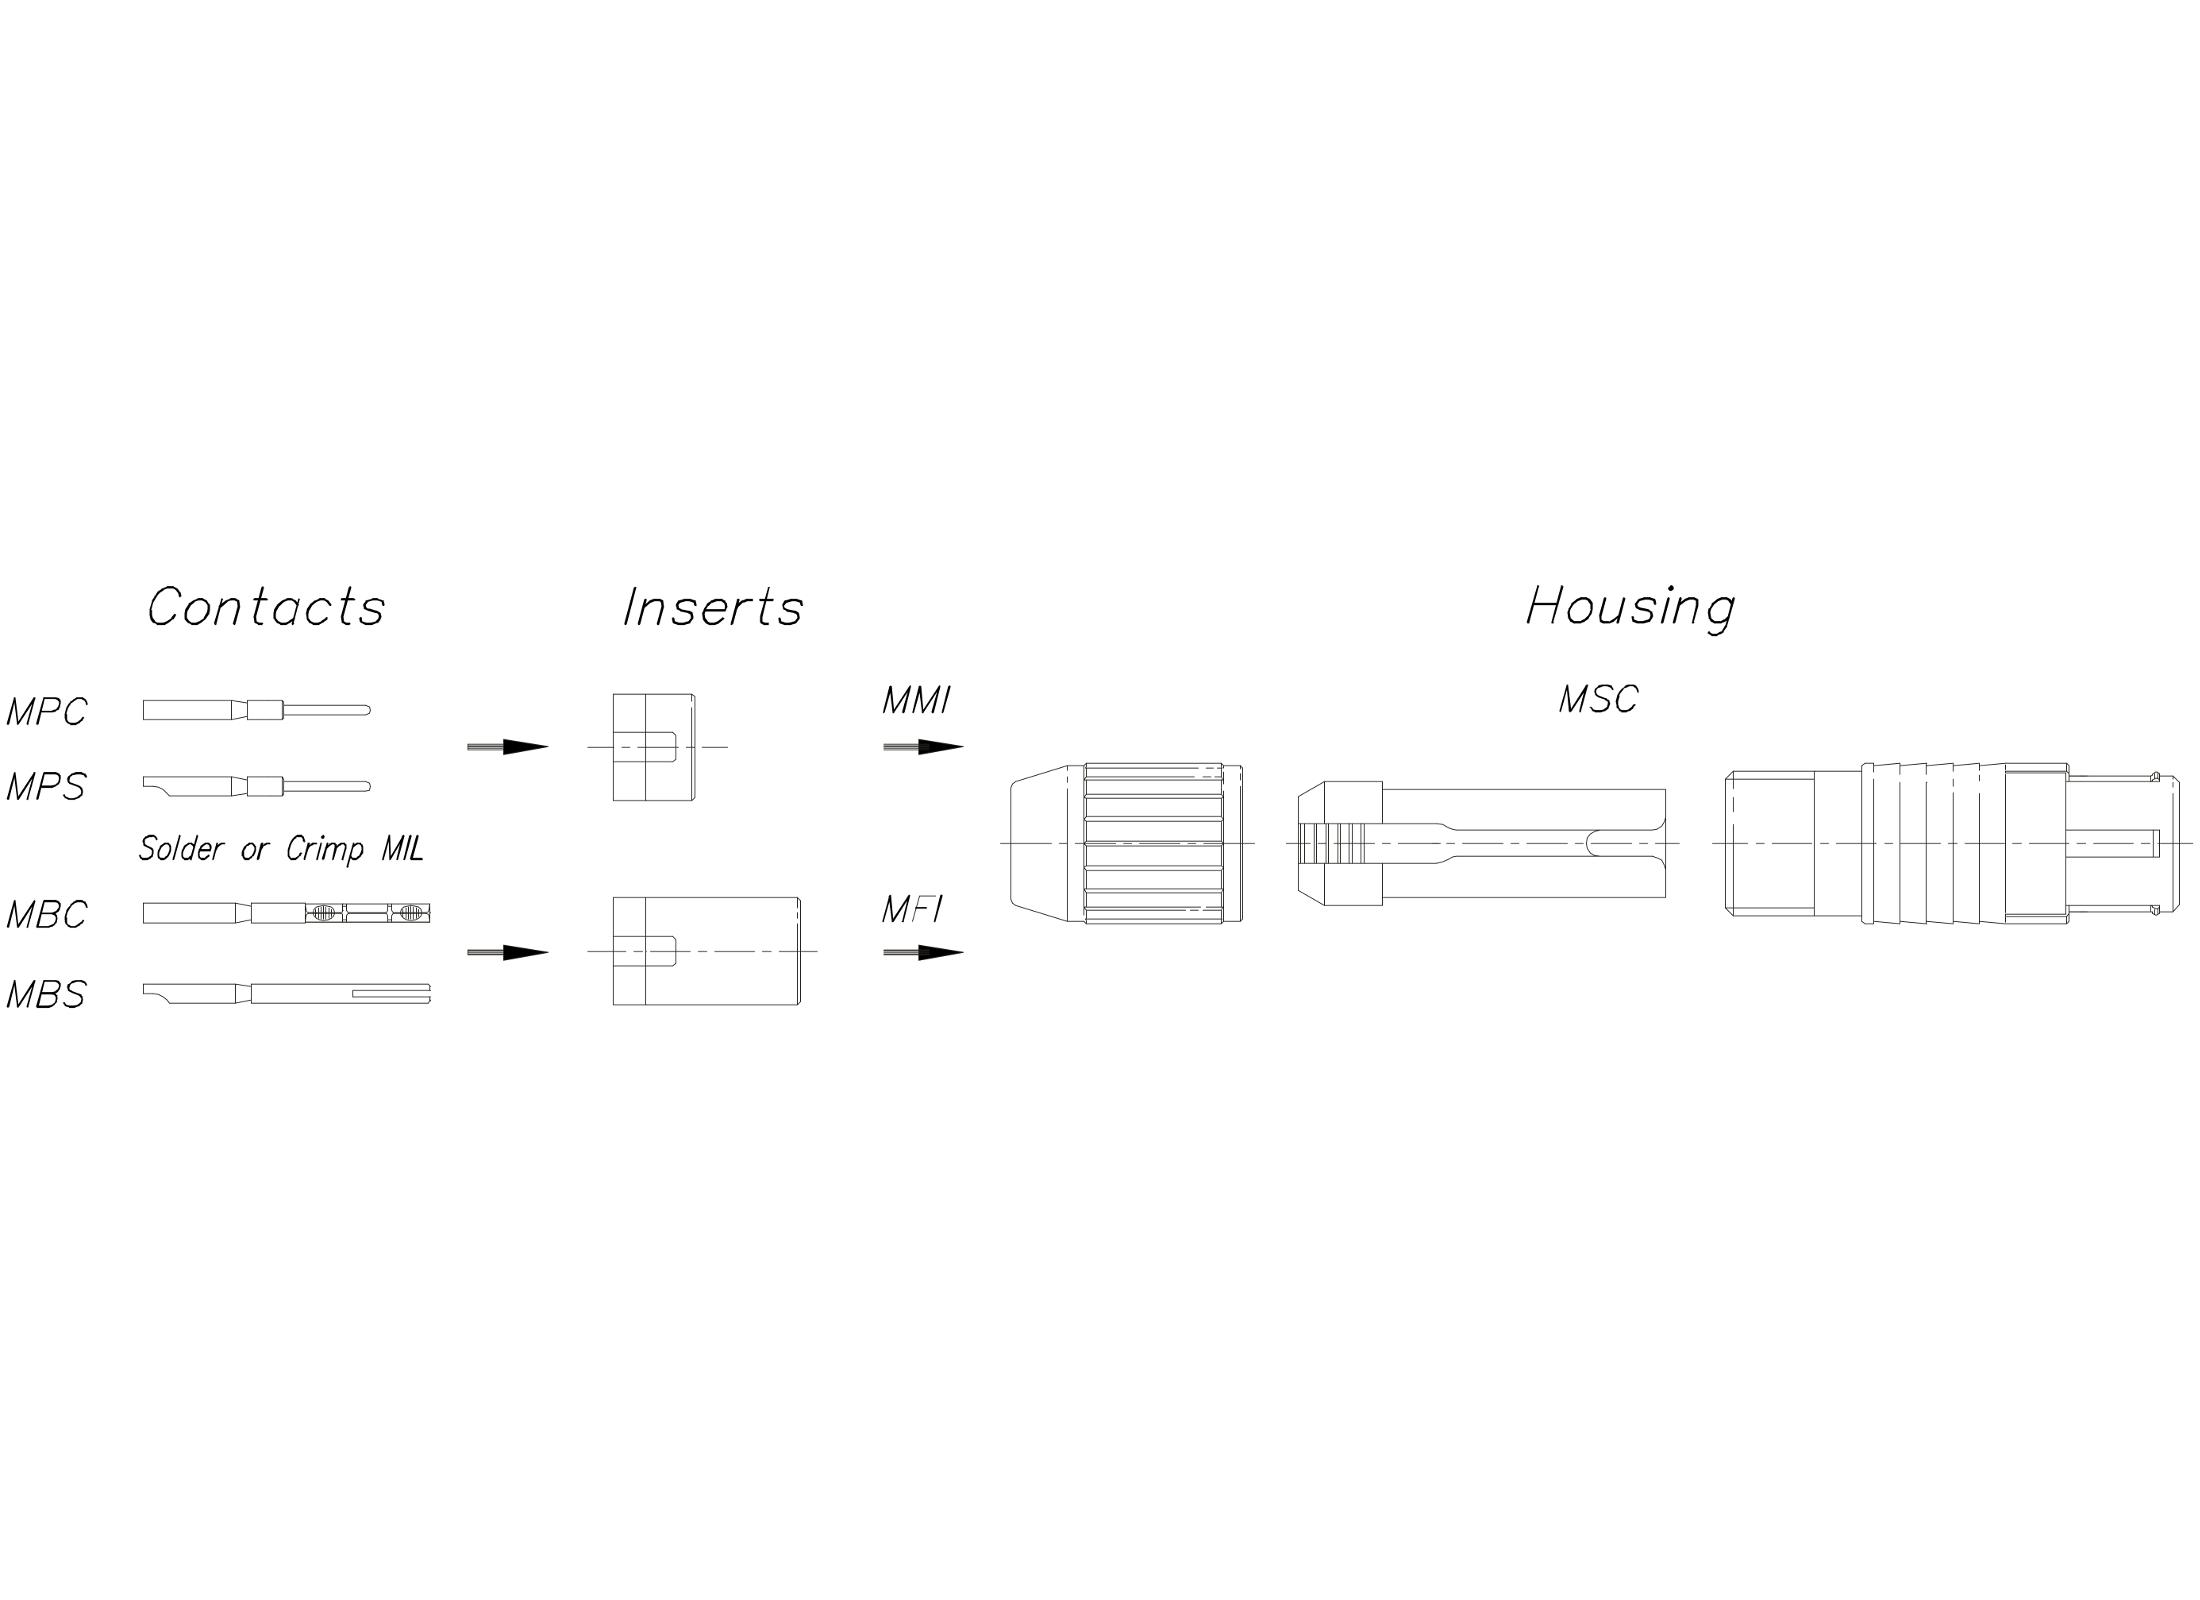 neutrik powercon wiring diagram passive bass wiring. Black Bedroom Furniture Sets. Home Design Ideas